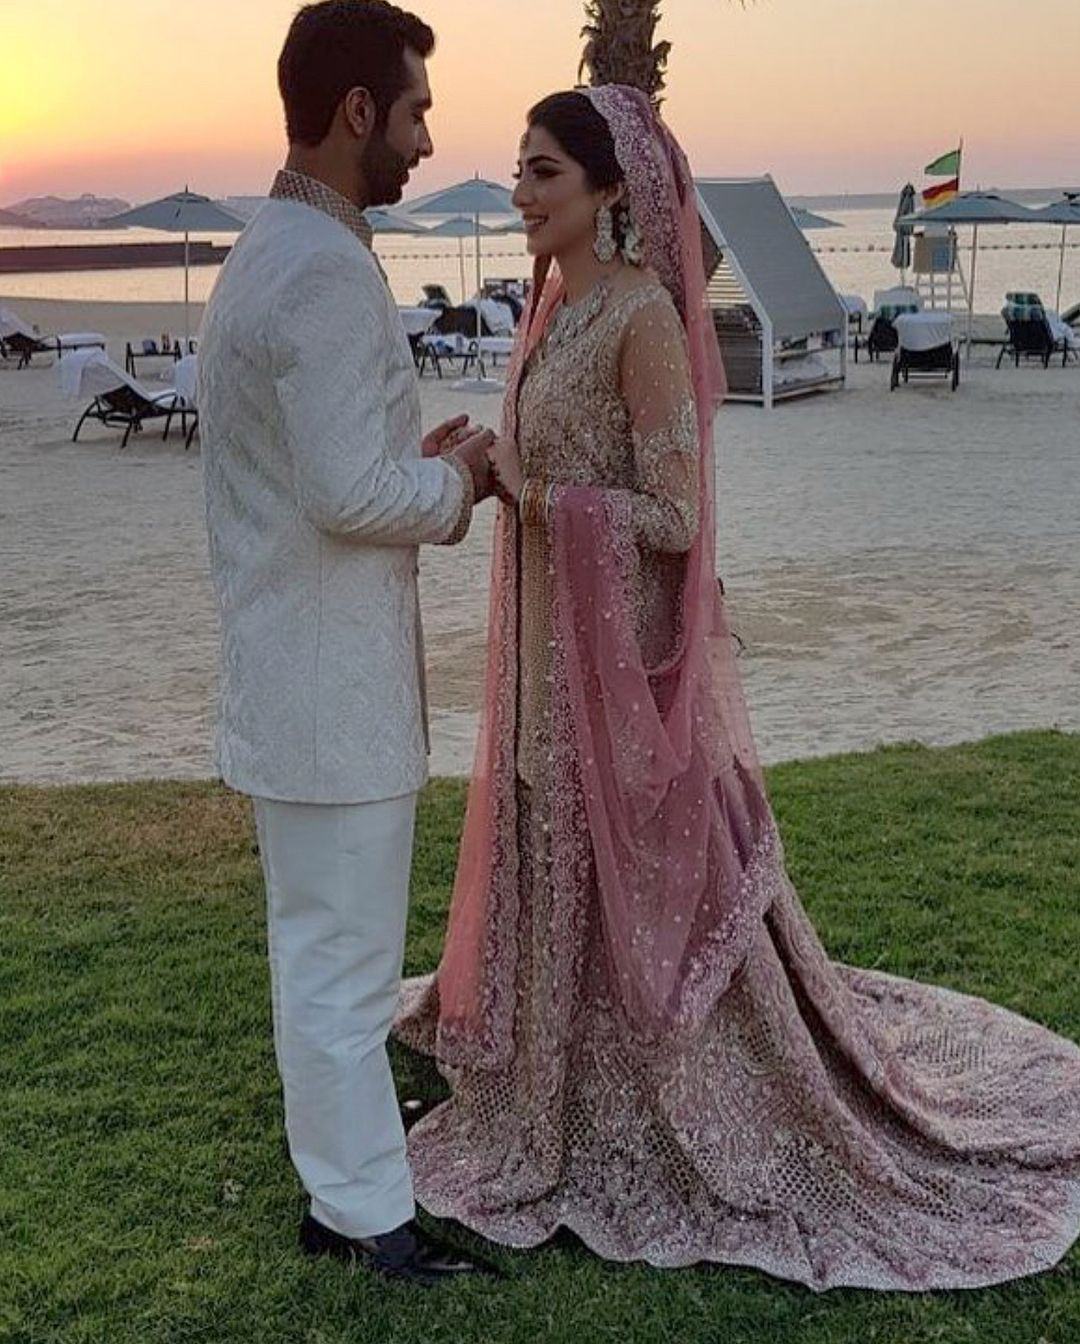 61f2bb14d1 Harris Nadeem & Manahil Malik both in @farazmanan Couture at their wedding # farazmanan #farazmanandubai #bride #groom #hautecouture #bridal #signature  ...